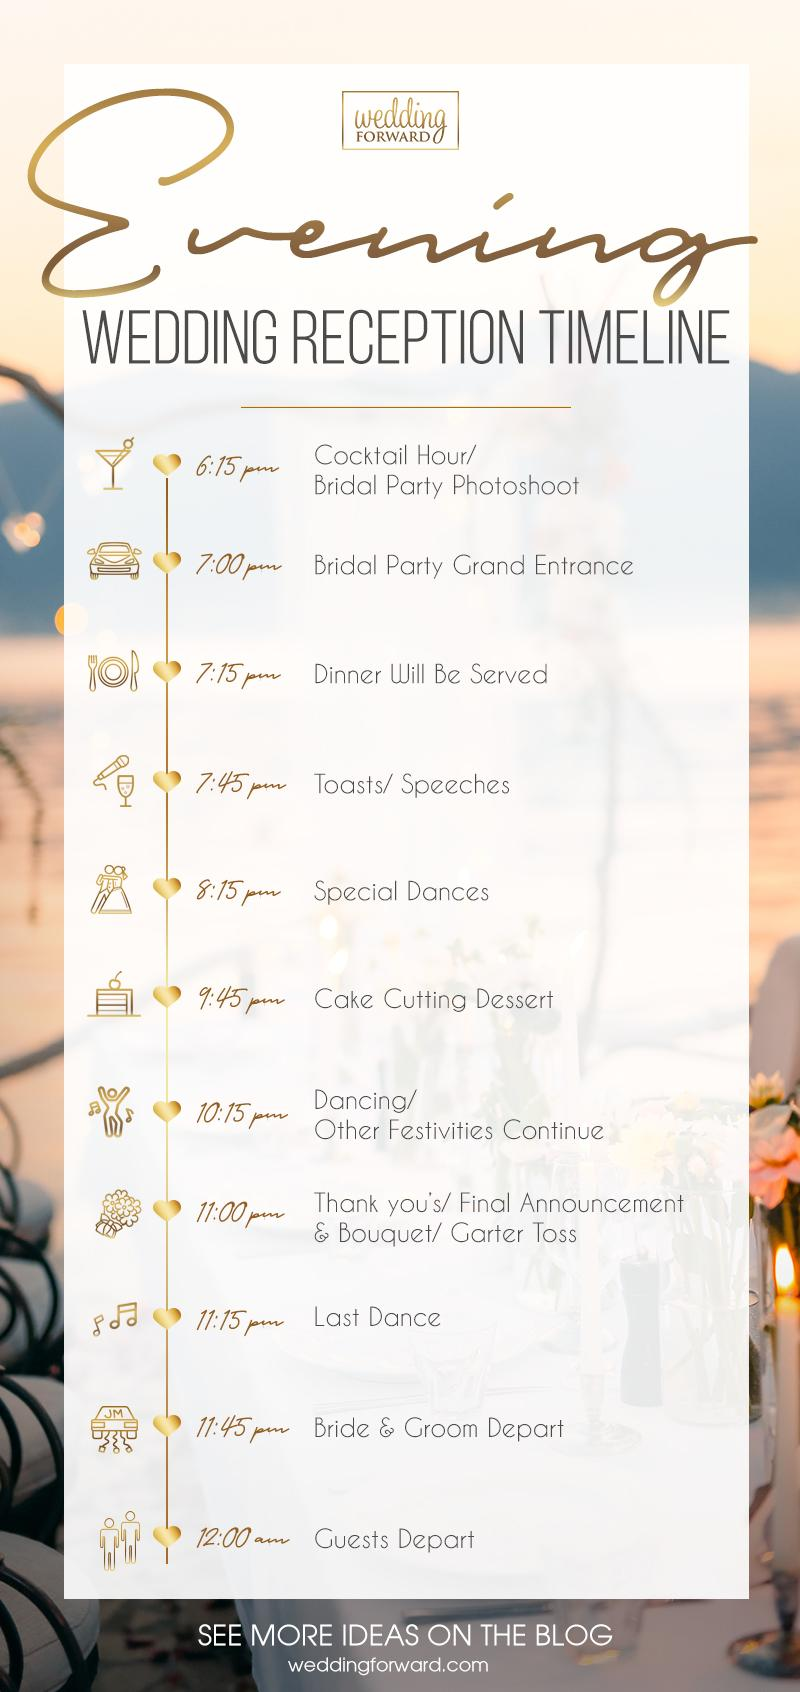 Wedding Reception Timeline: Expert Tips To Create & 3 Sample Ideas